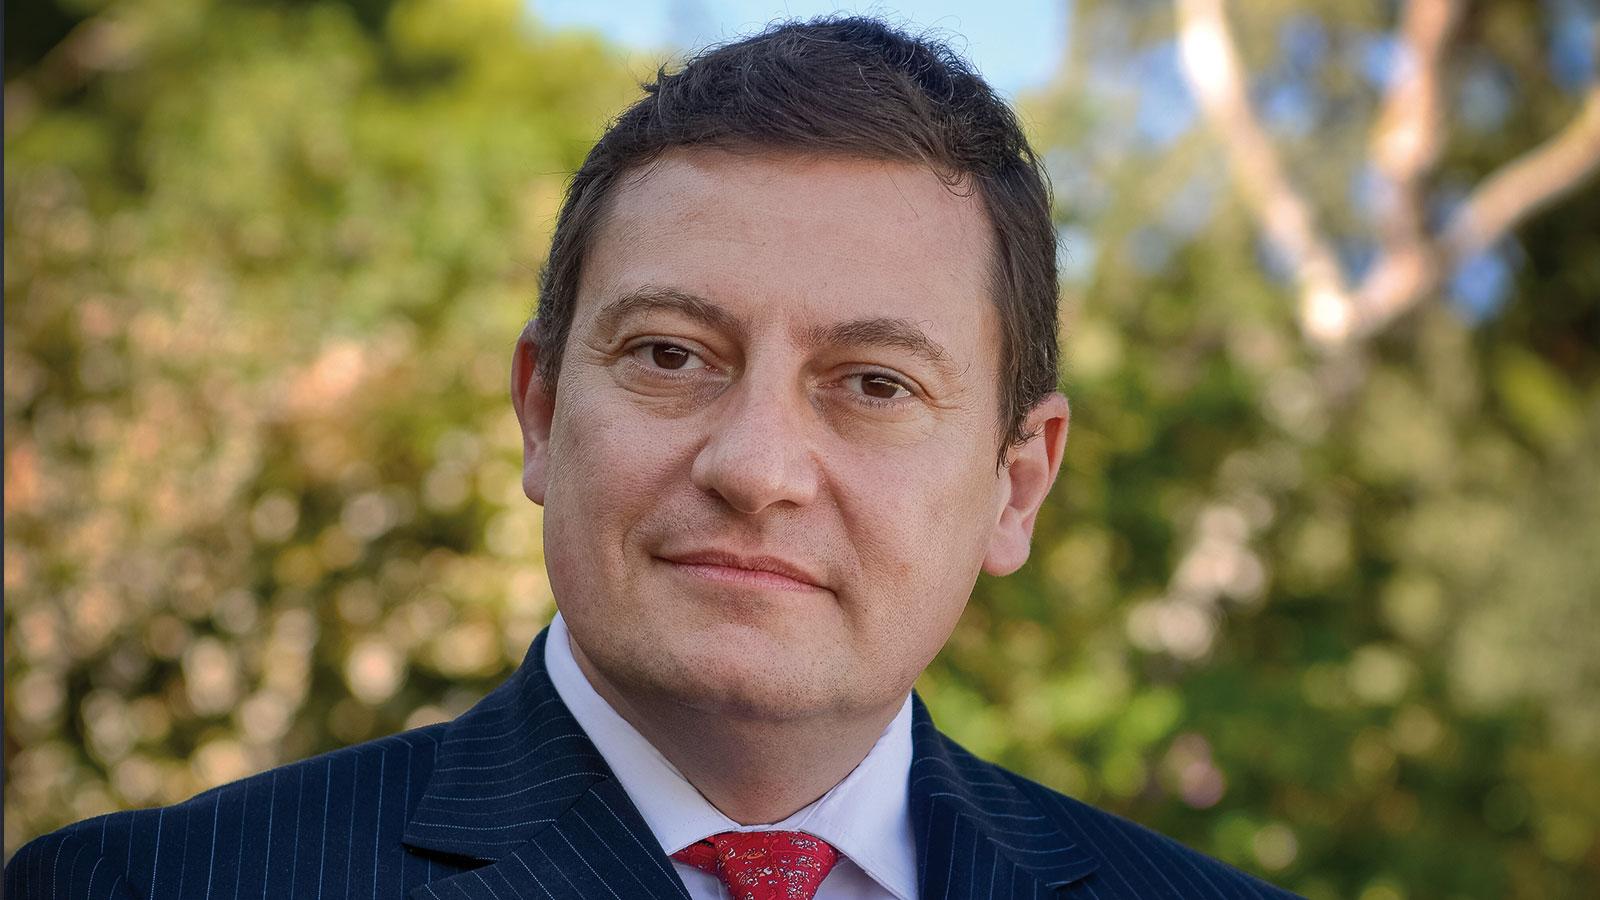 guillaume-rose-monaco-economic-board-observateur